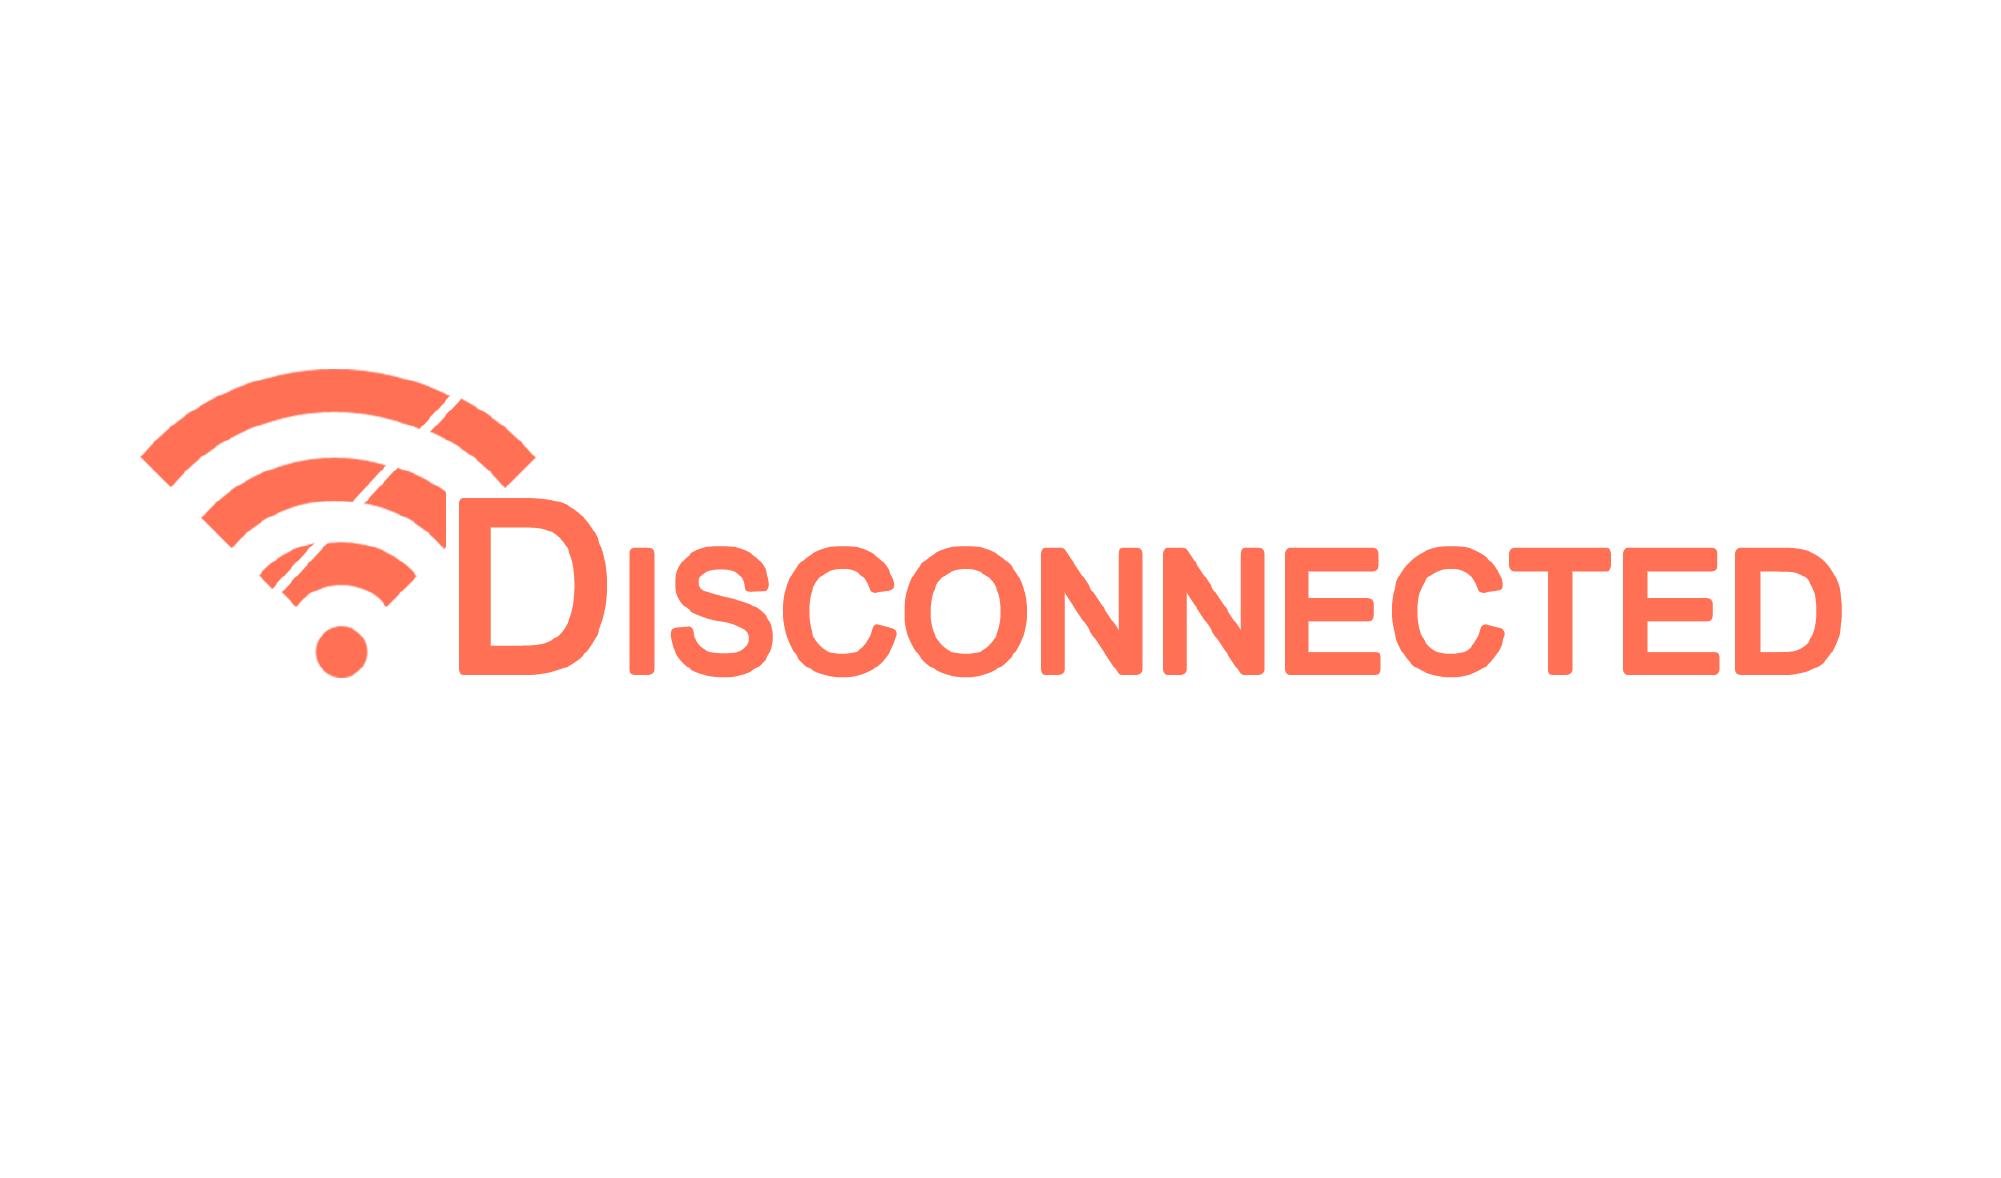 App UI - Disconnected